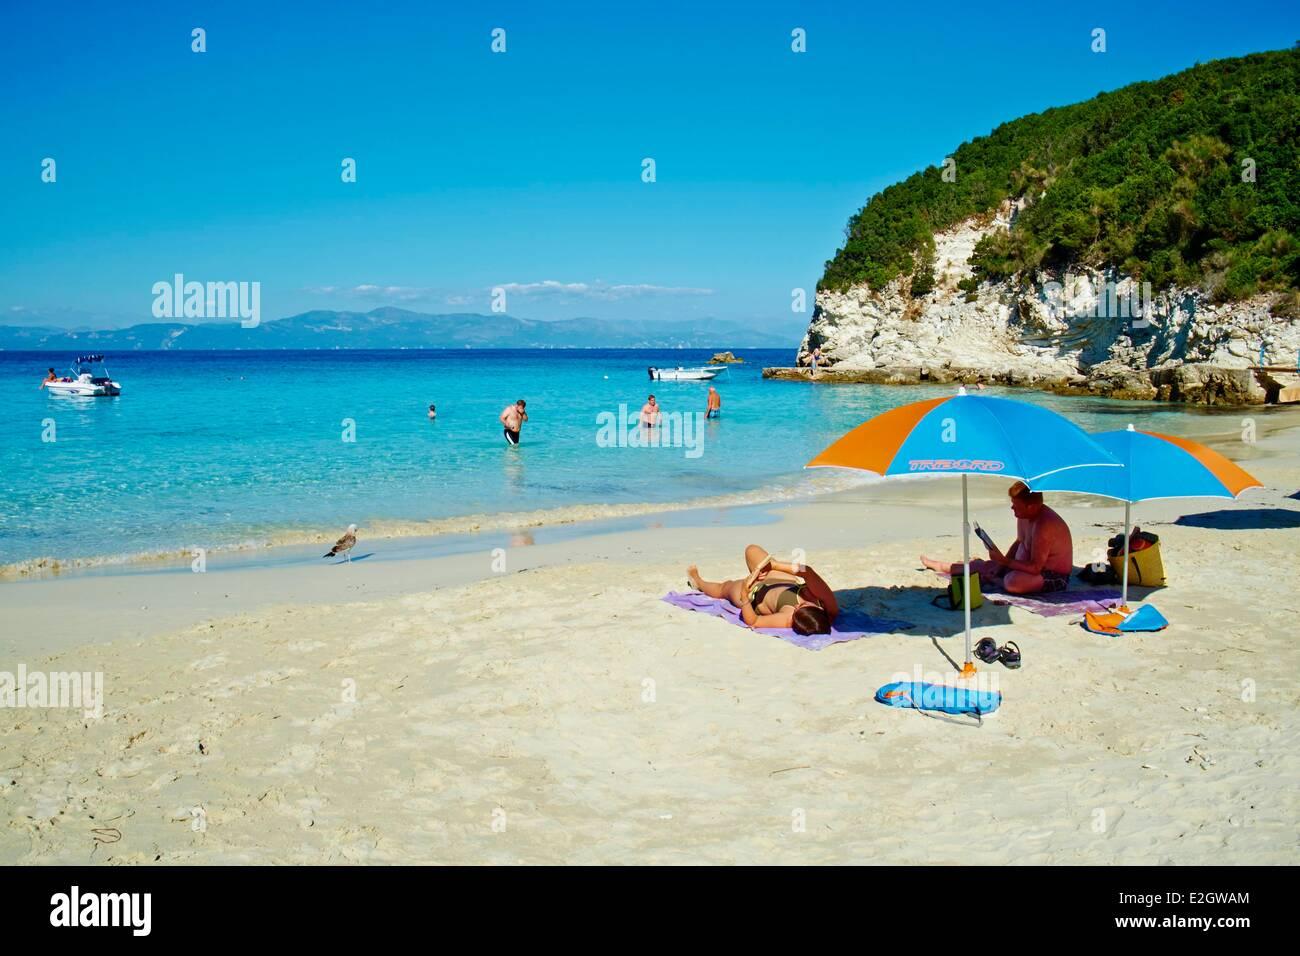 Greece Ionian island Antipaxi Antipaxos Vrika beach - Stock Image